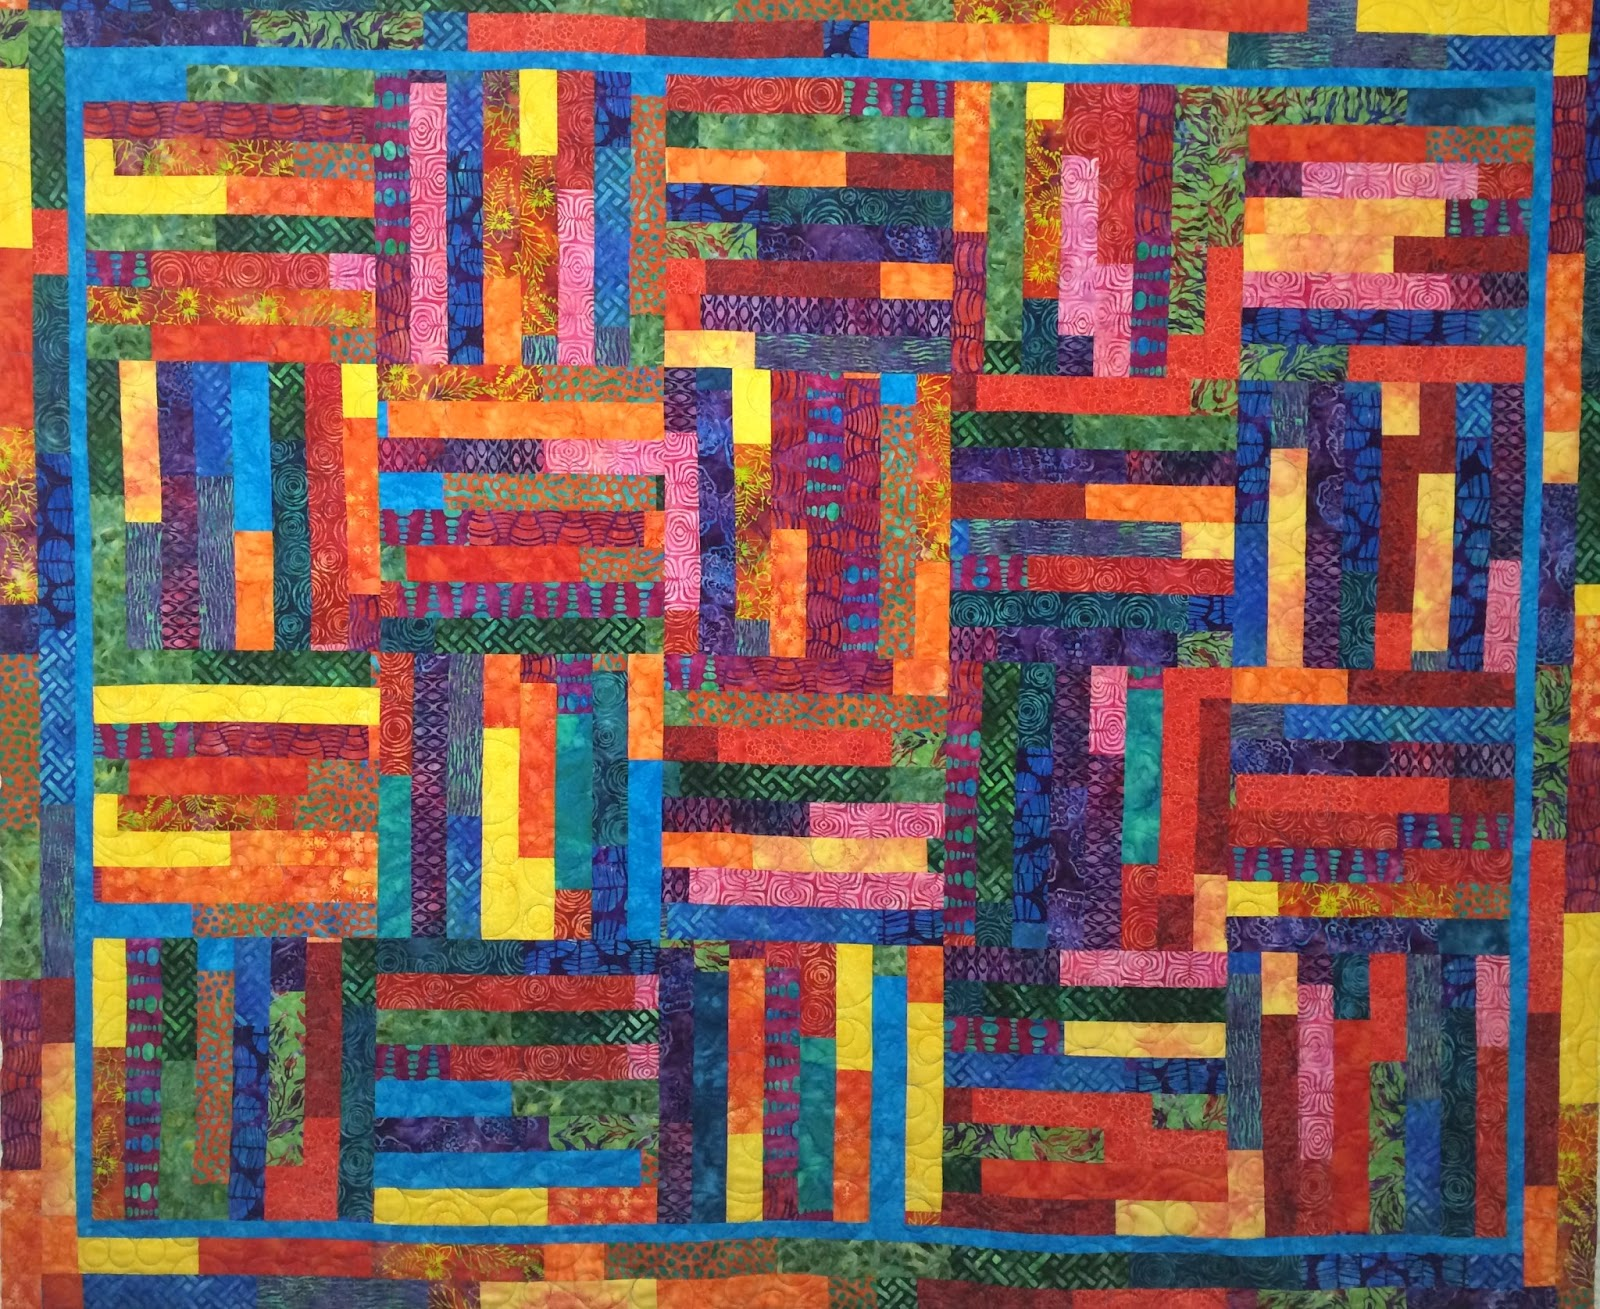 Kathleen Kurdziel's Very Berry Quilt